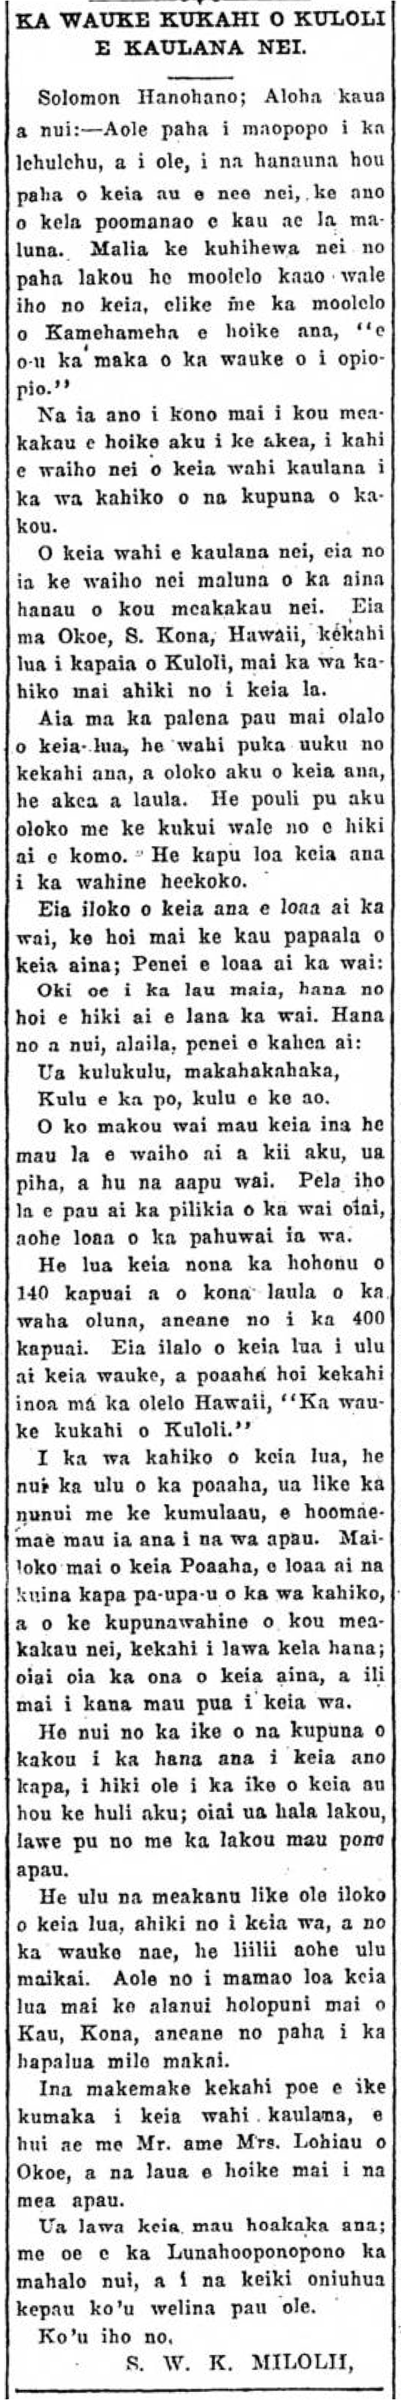 Kuokoa_2_22_1923_7